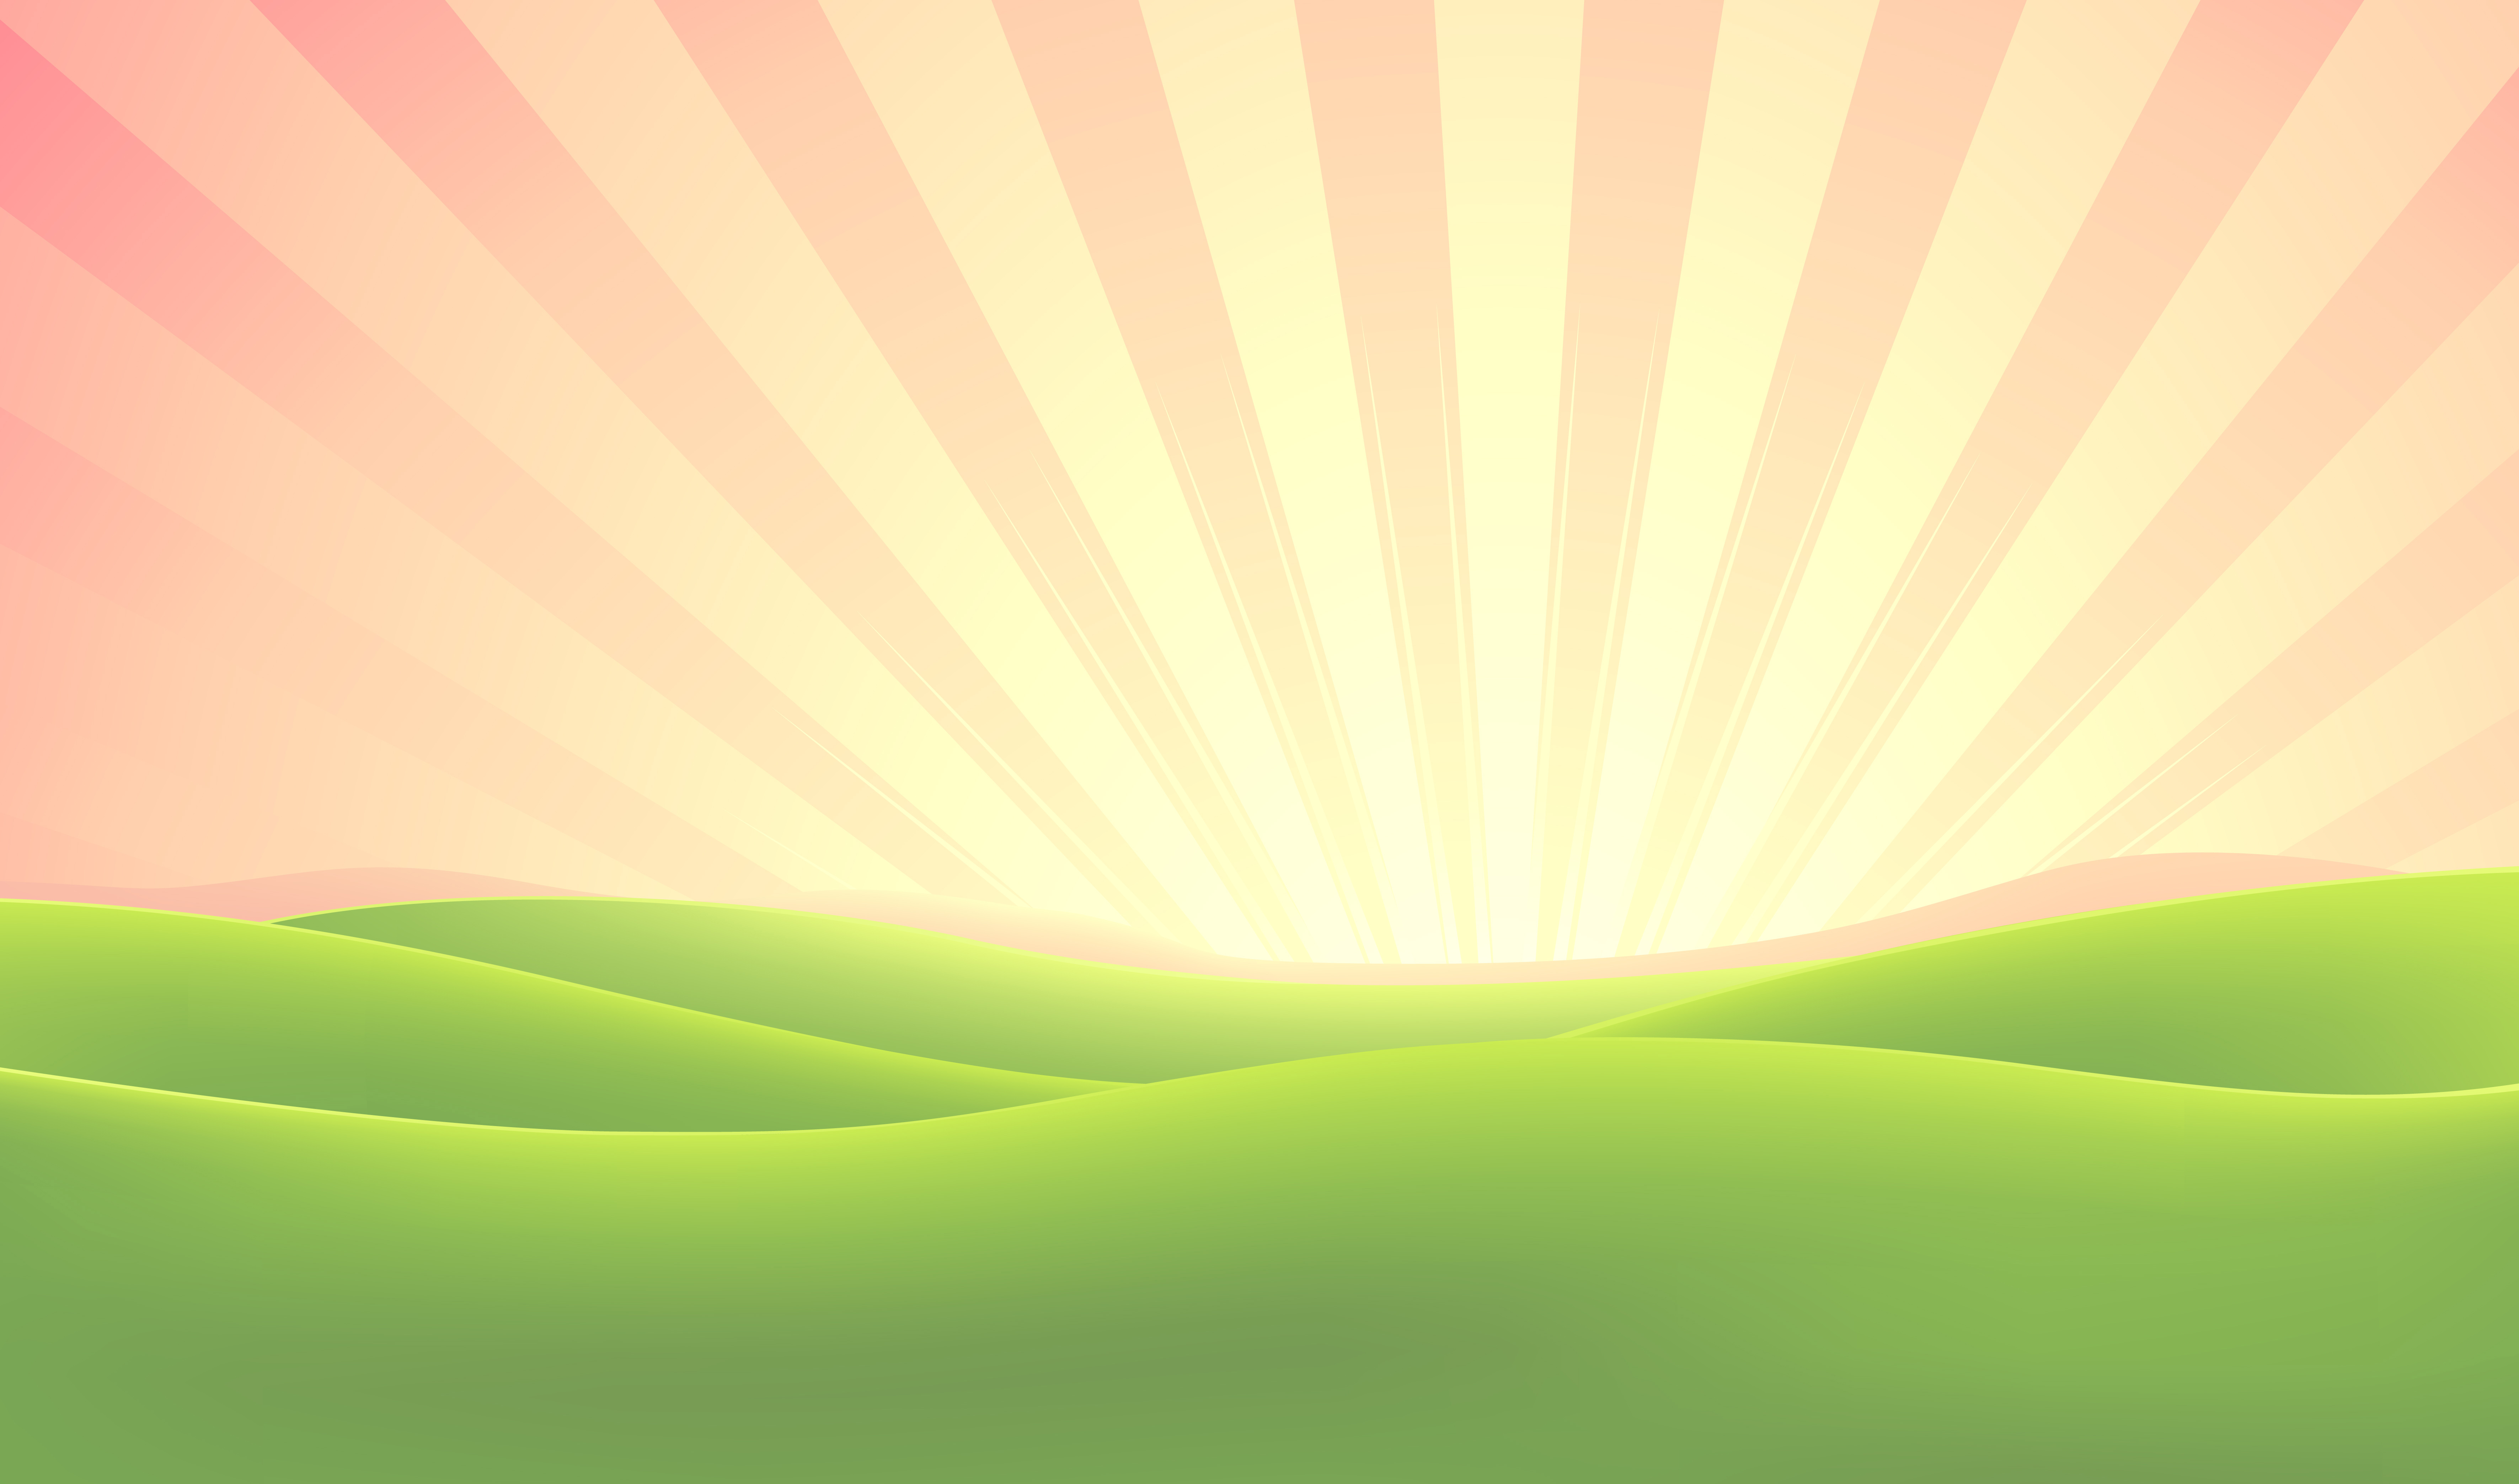 Summer Nature Sunrise Background - Download Free Vectors ...